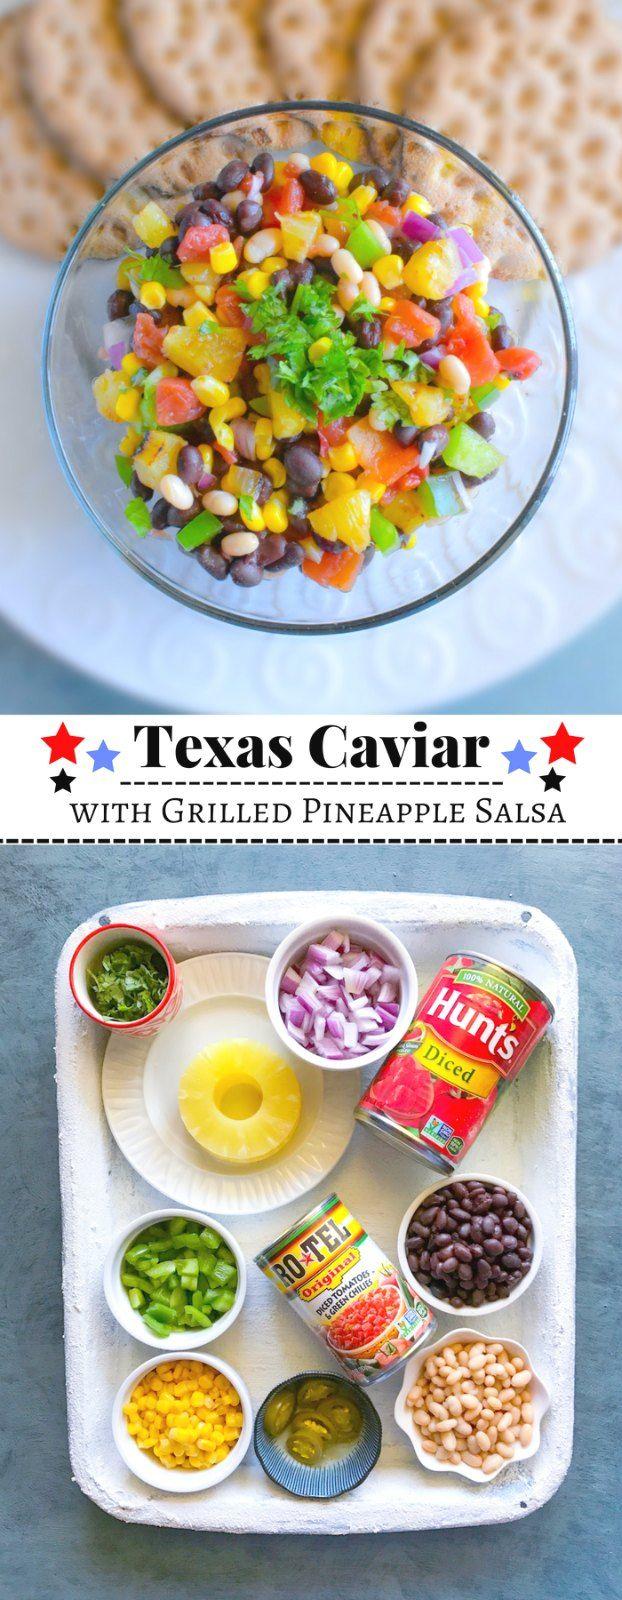 Texas Caviar with Grilled Pineapple Salsa: #texas #caviar #cowboy #ad #ServeUpSummer @roteltomatoes @huntschef @walmart